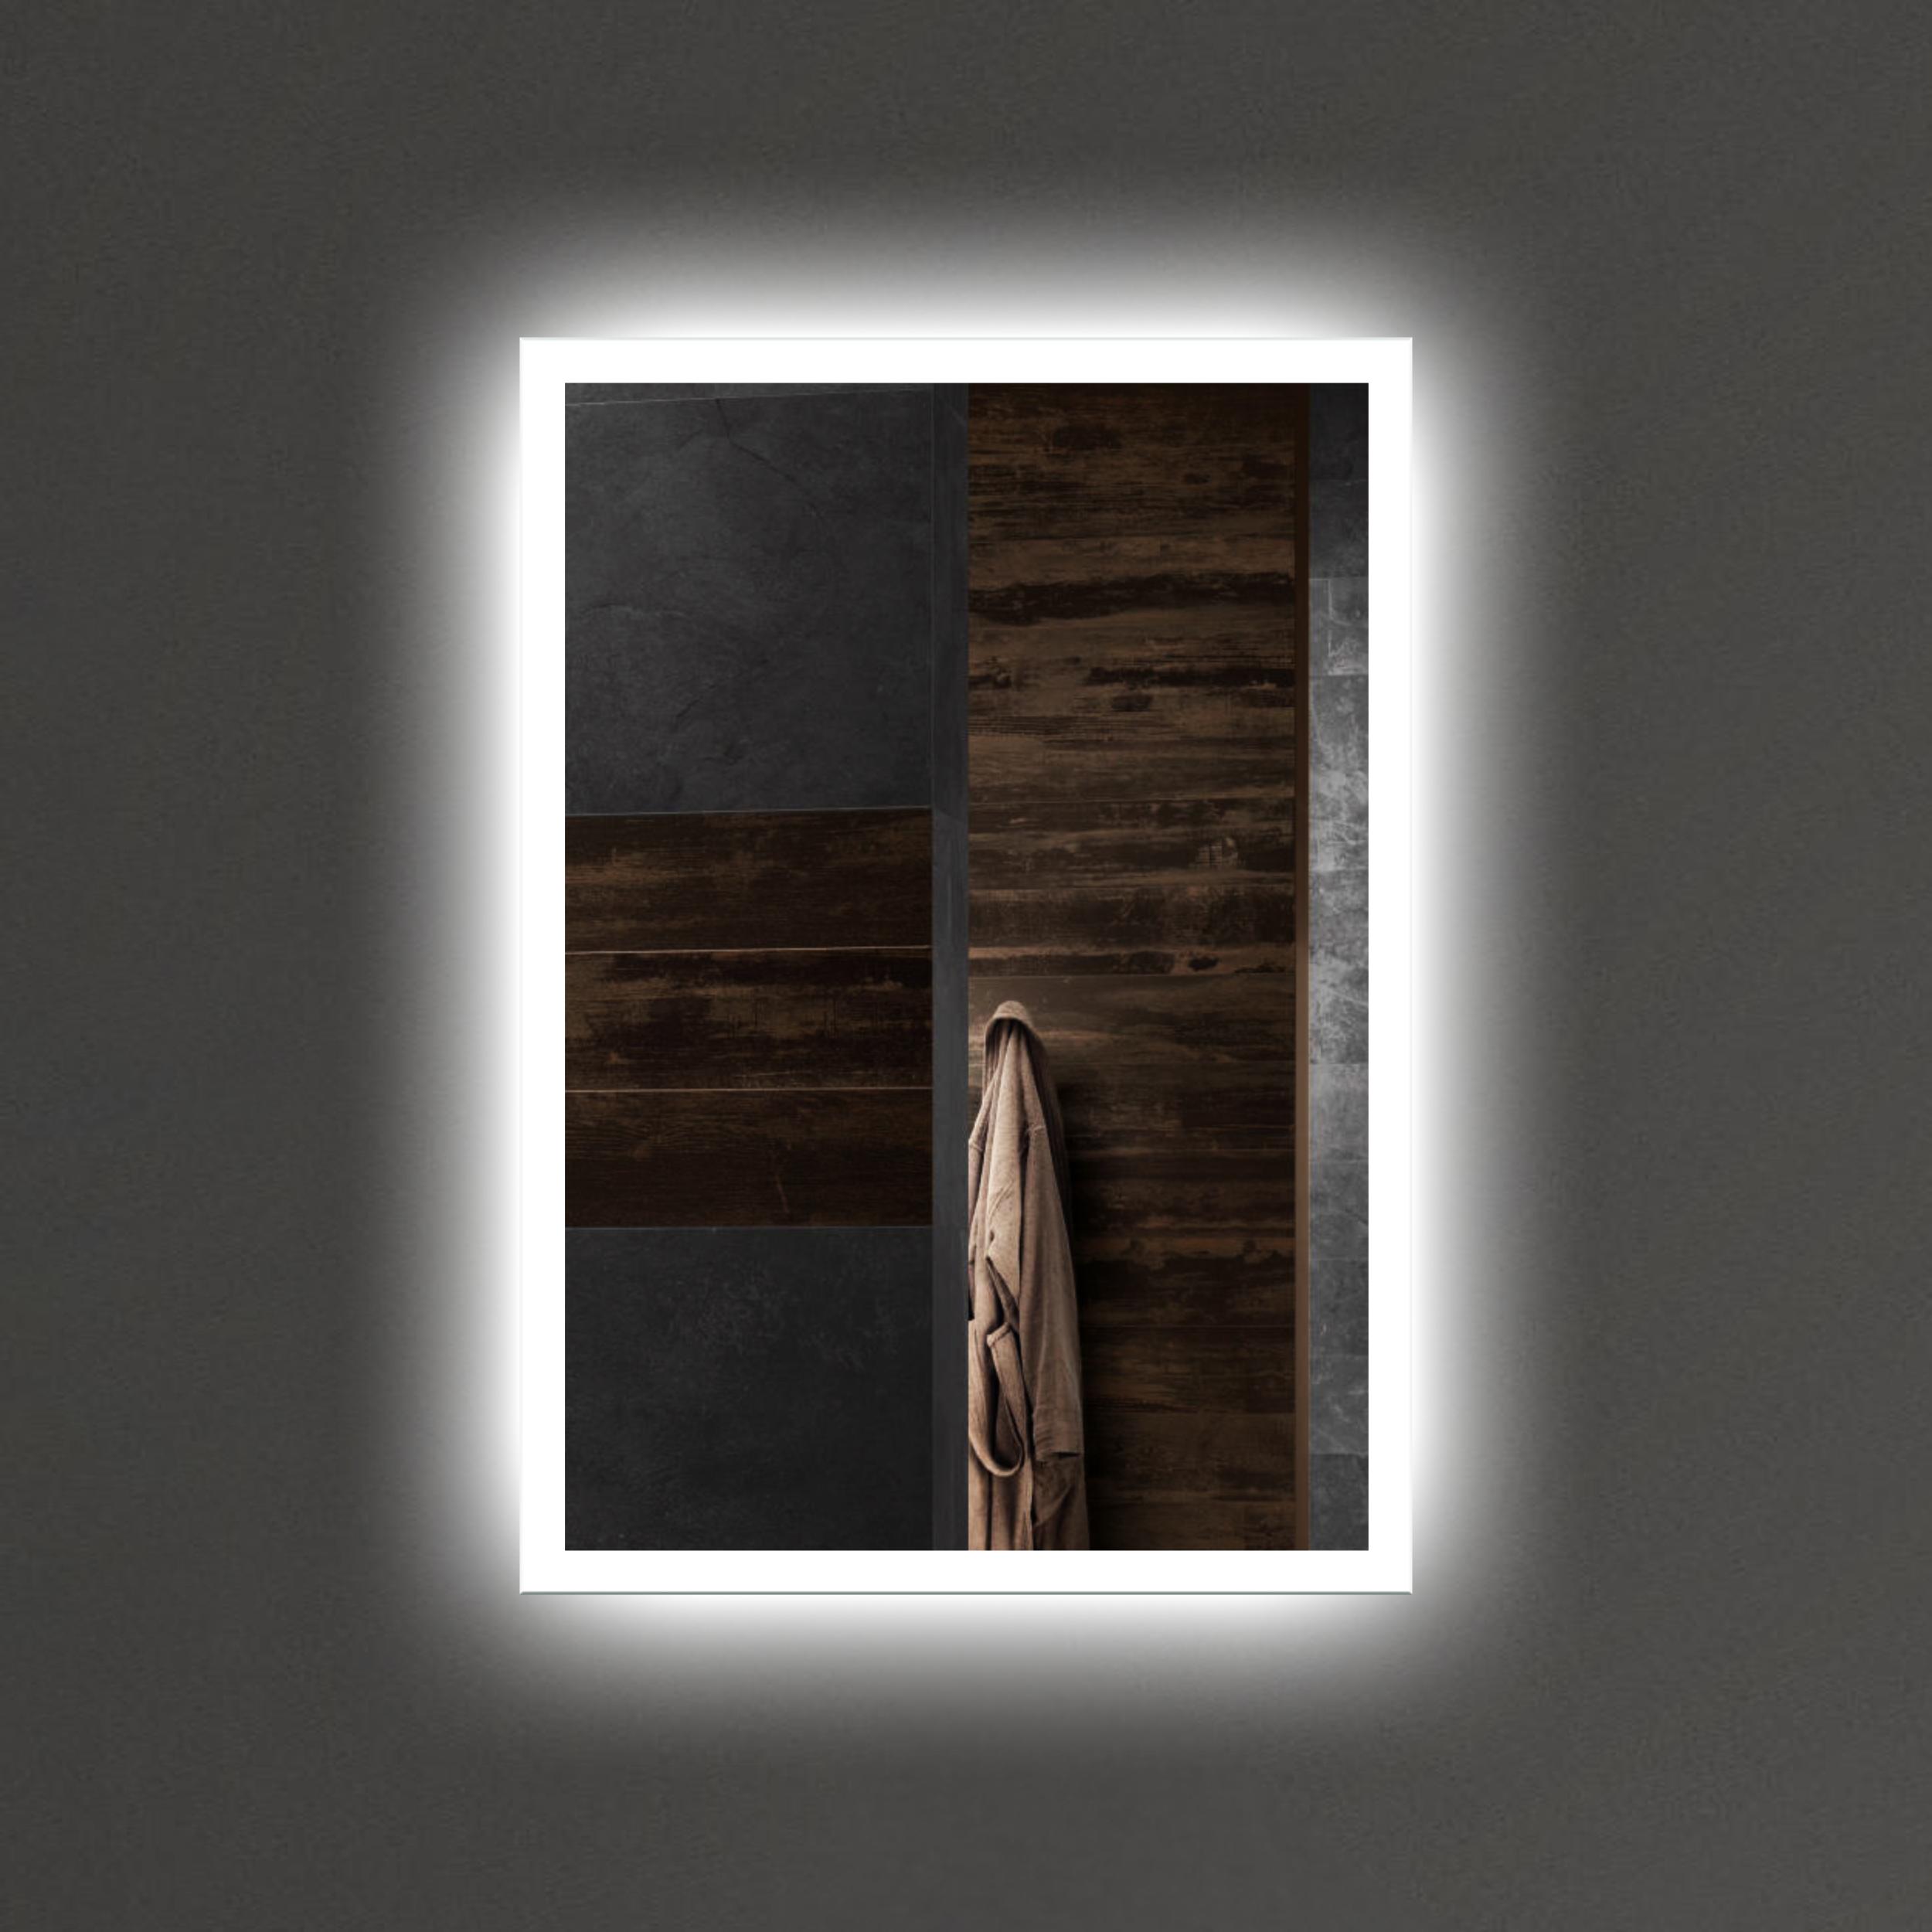 Turbo Badspiegel mit LED Beleuchtung LED Spiegel Beleuchtet Wandspiegel FE99